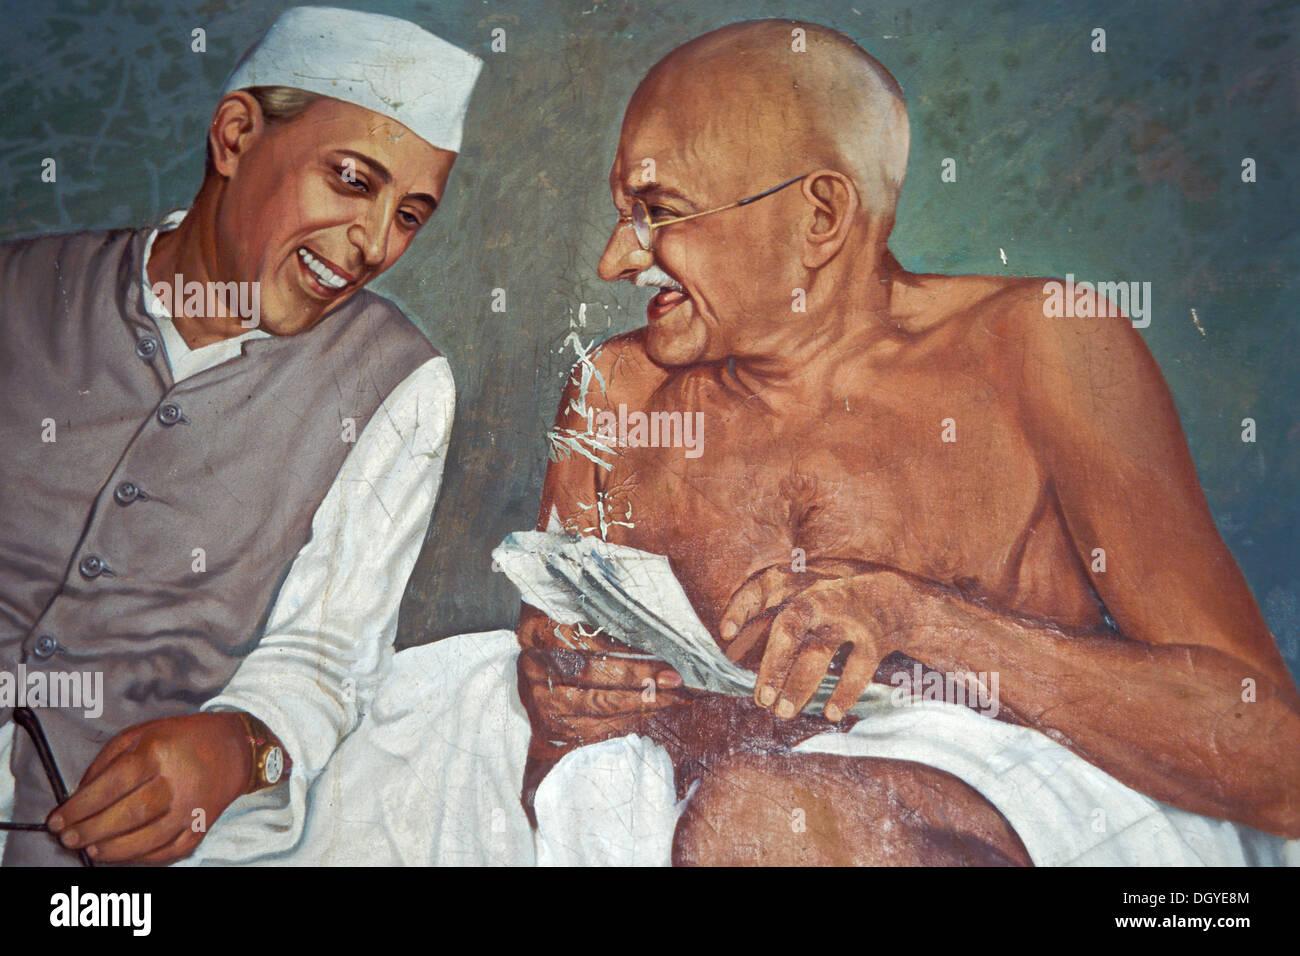 Painting, Pandit Jawaharlal Nehru, India's first prime minister with Gandhi, Aga Khan Palace, Pune or Poona, Maharashtra, India - Stock Image